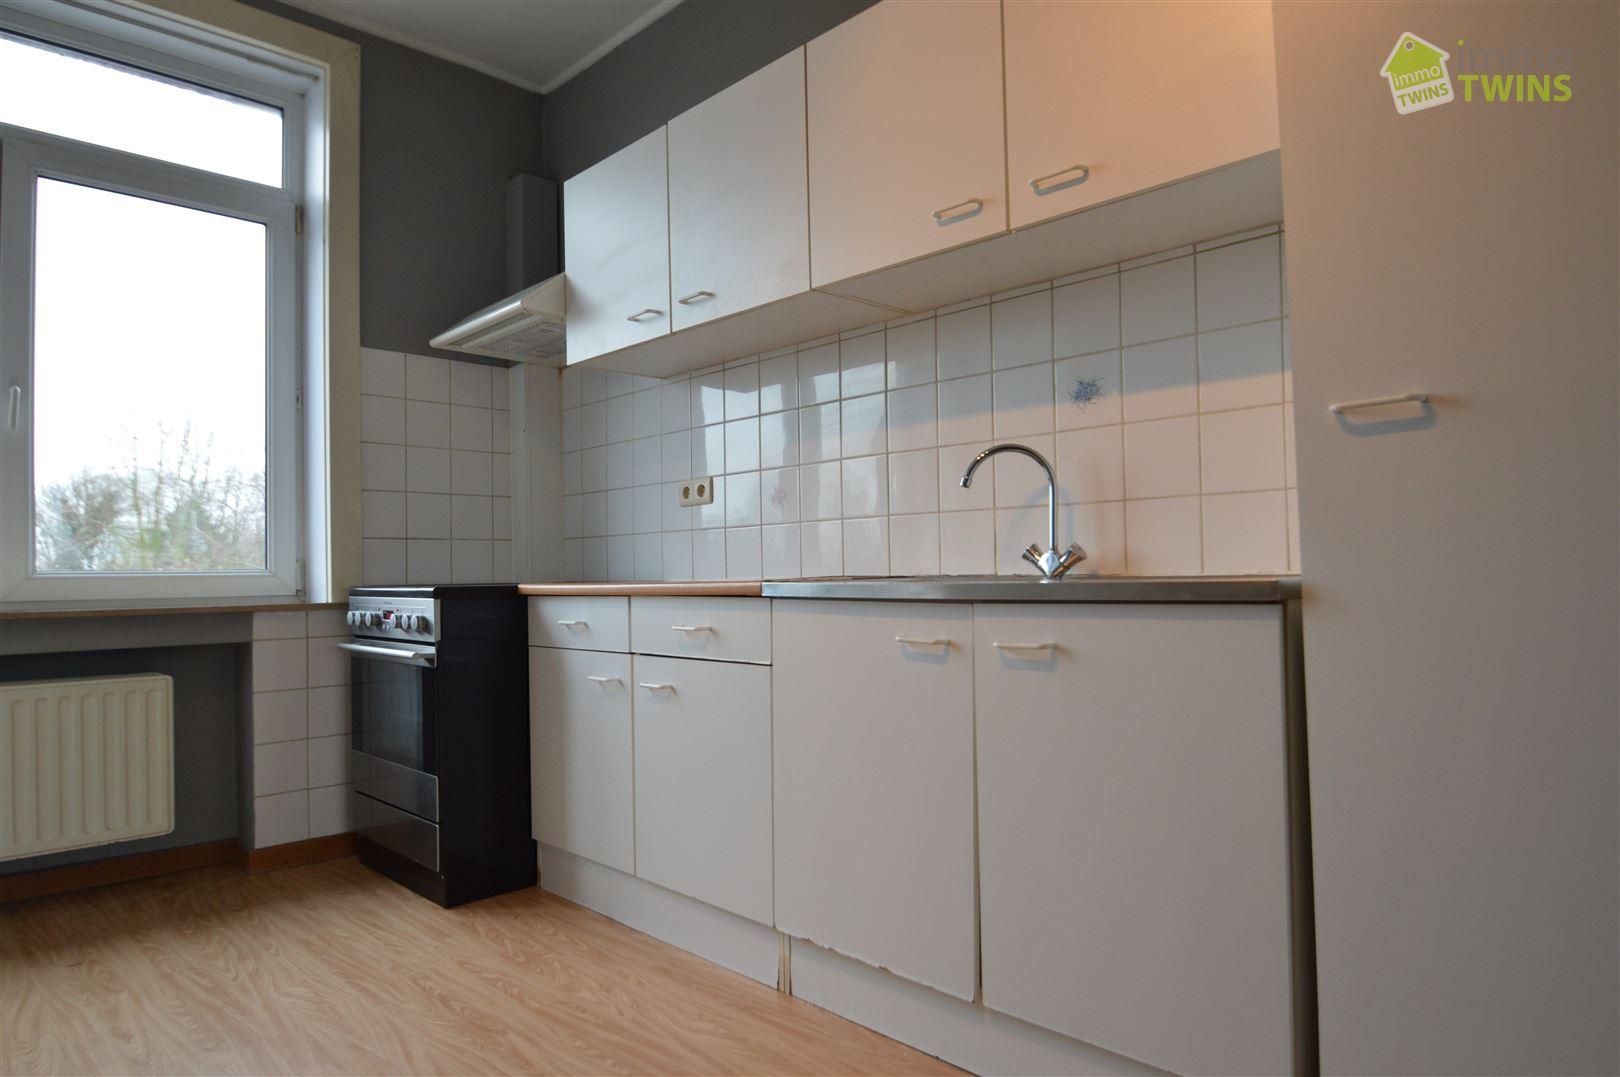 Foto 5 : Appartement te 9200 DENDERMONDE (België) - Prijs € 575